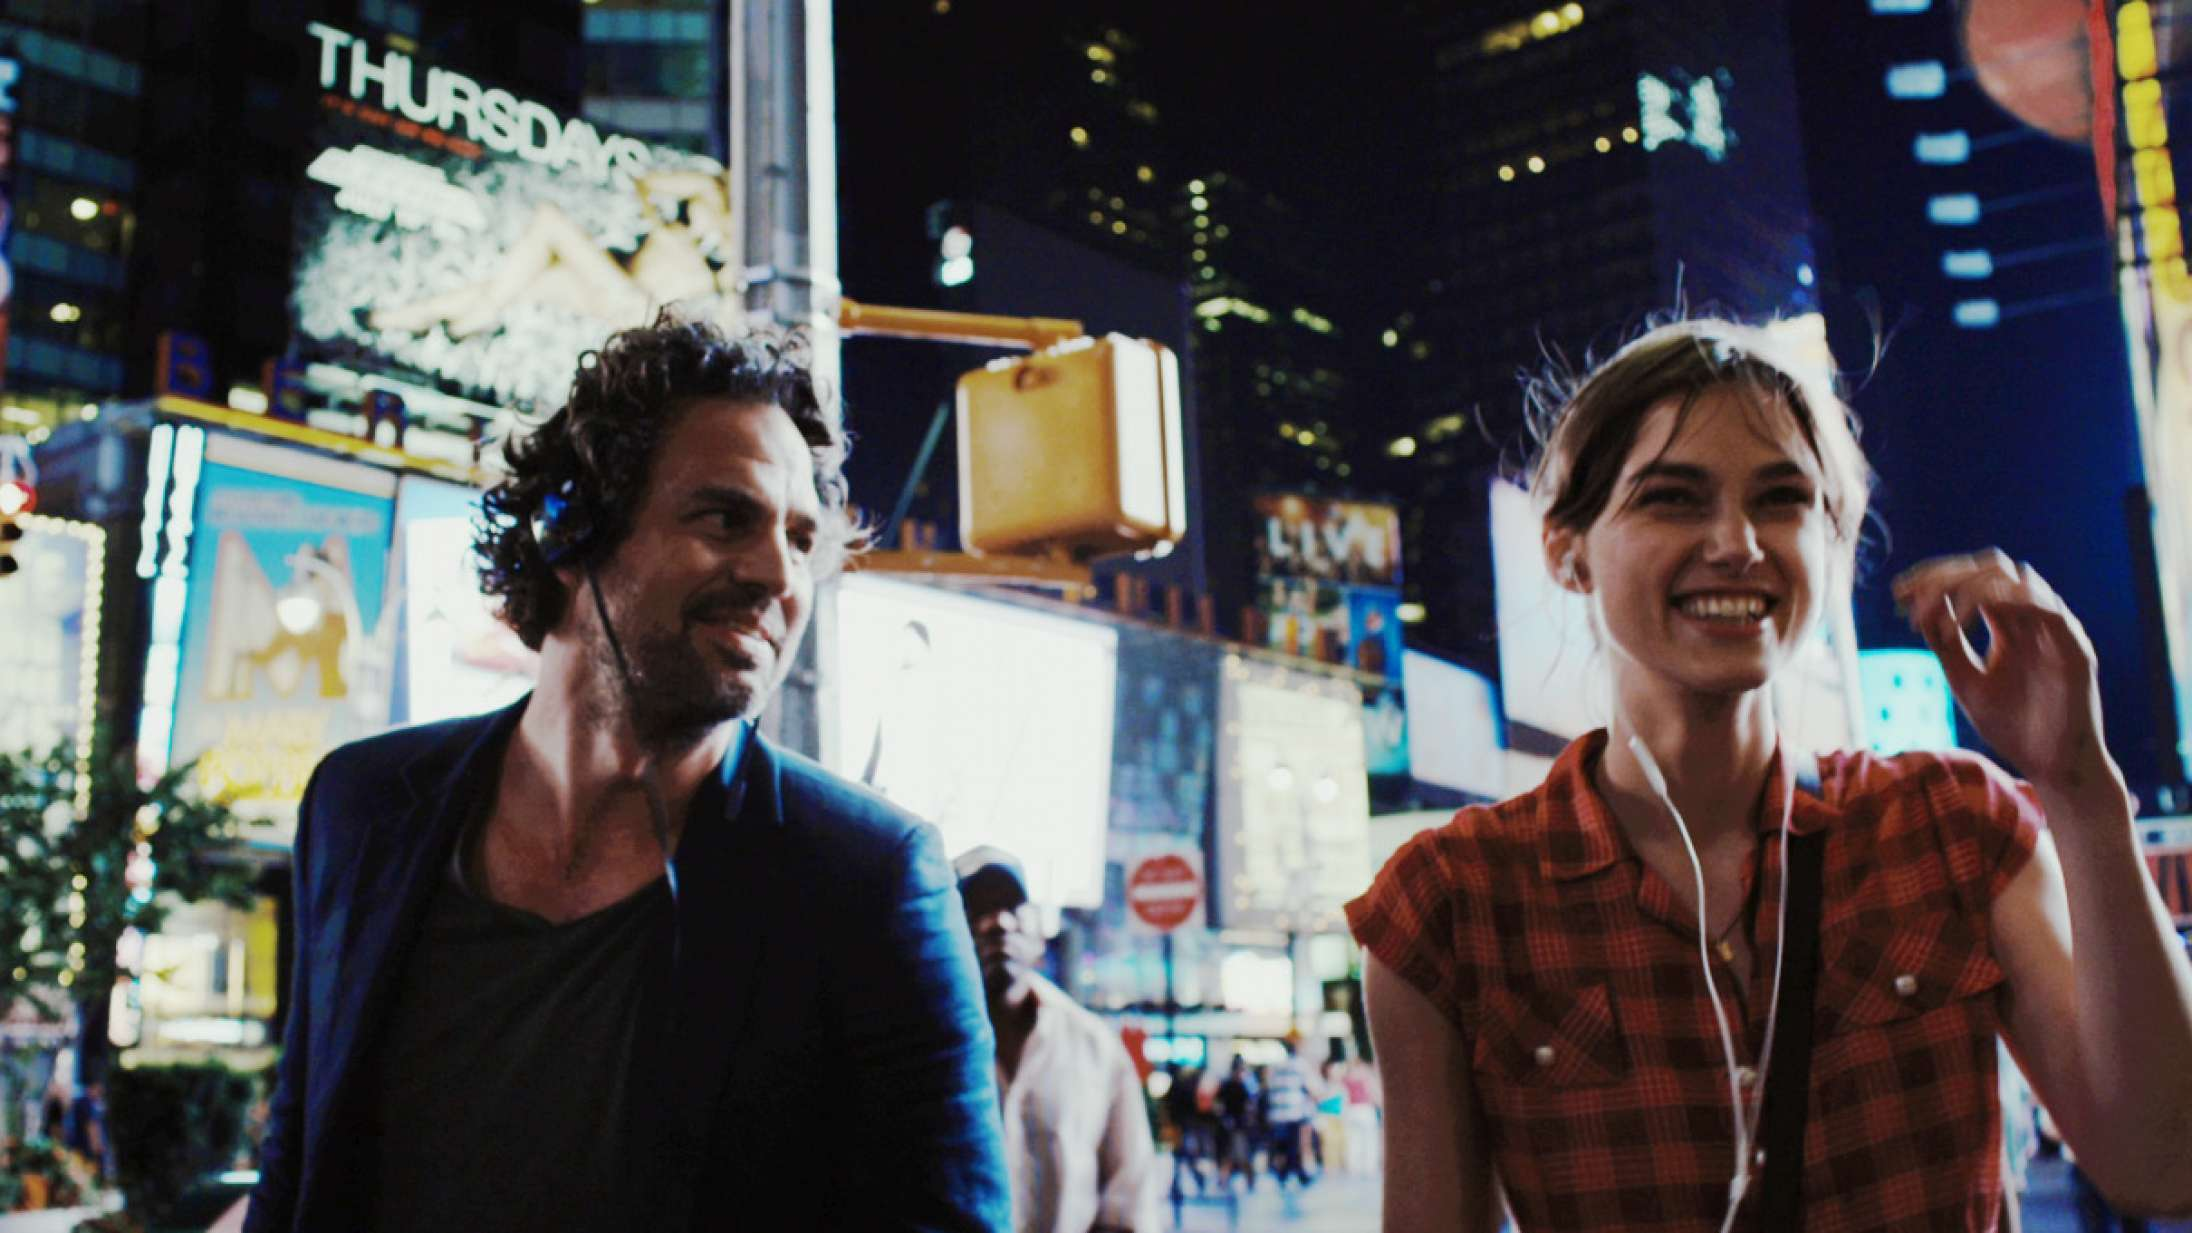 New York, I love you: Syv film, der får os til at savne det store æble i en coronatid